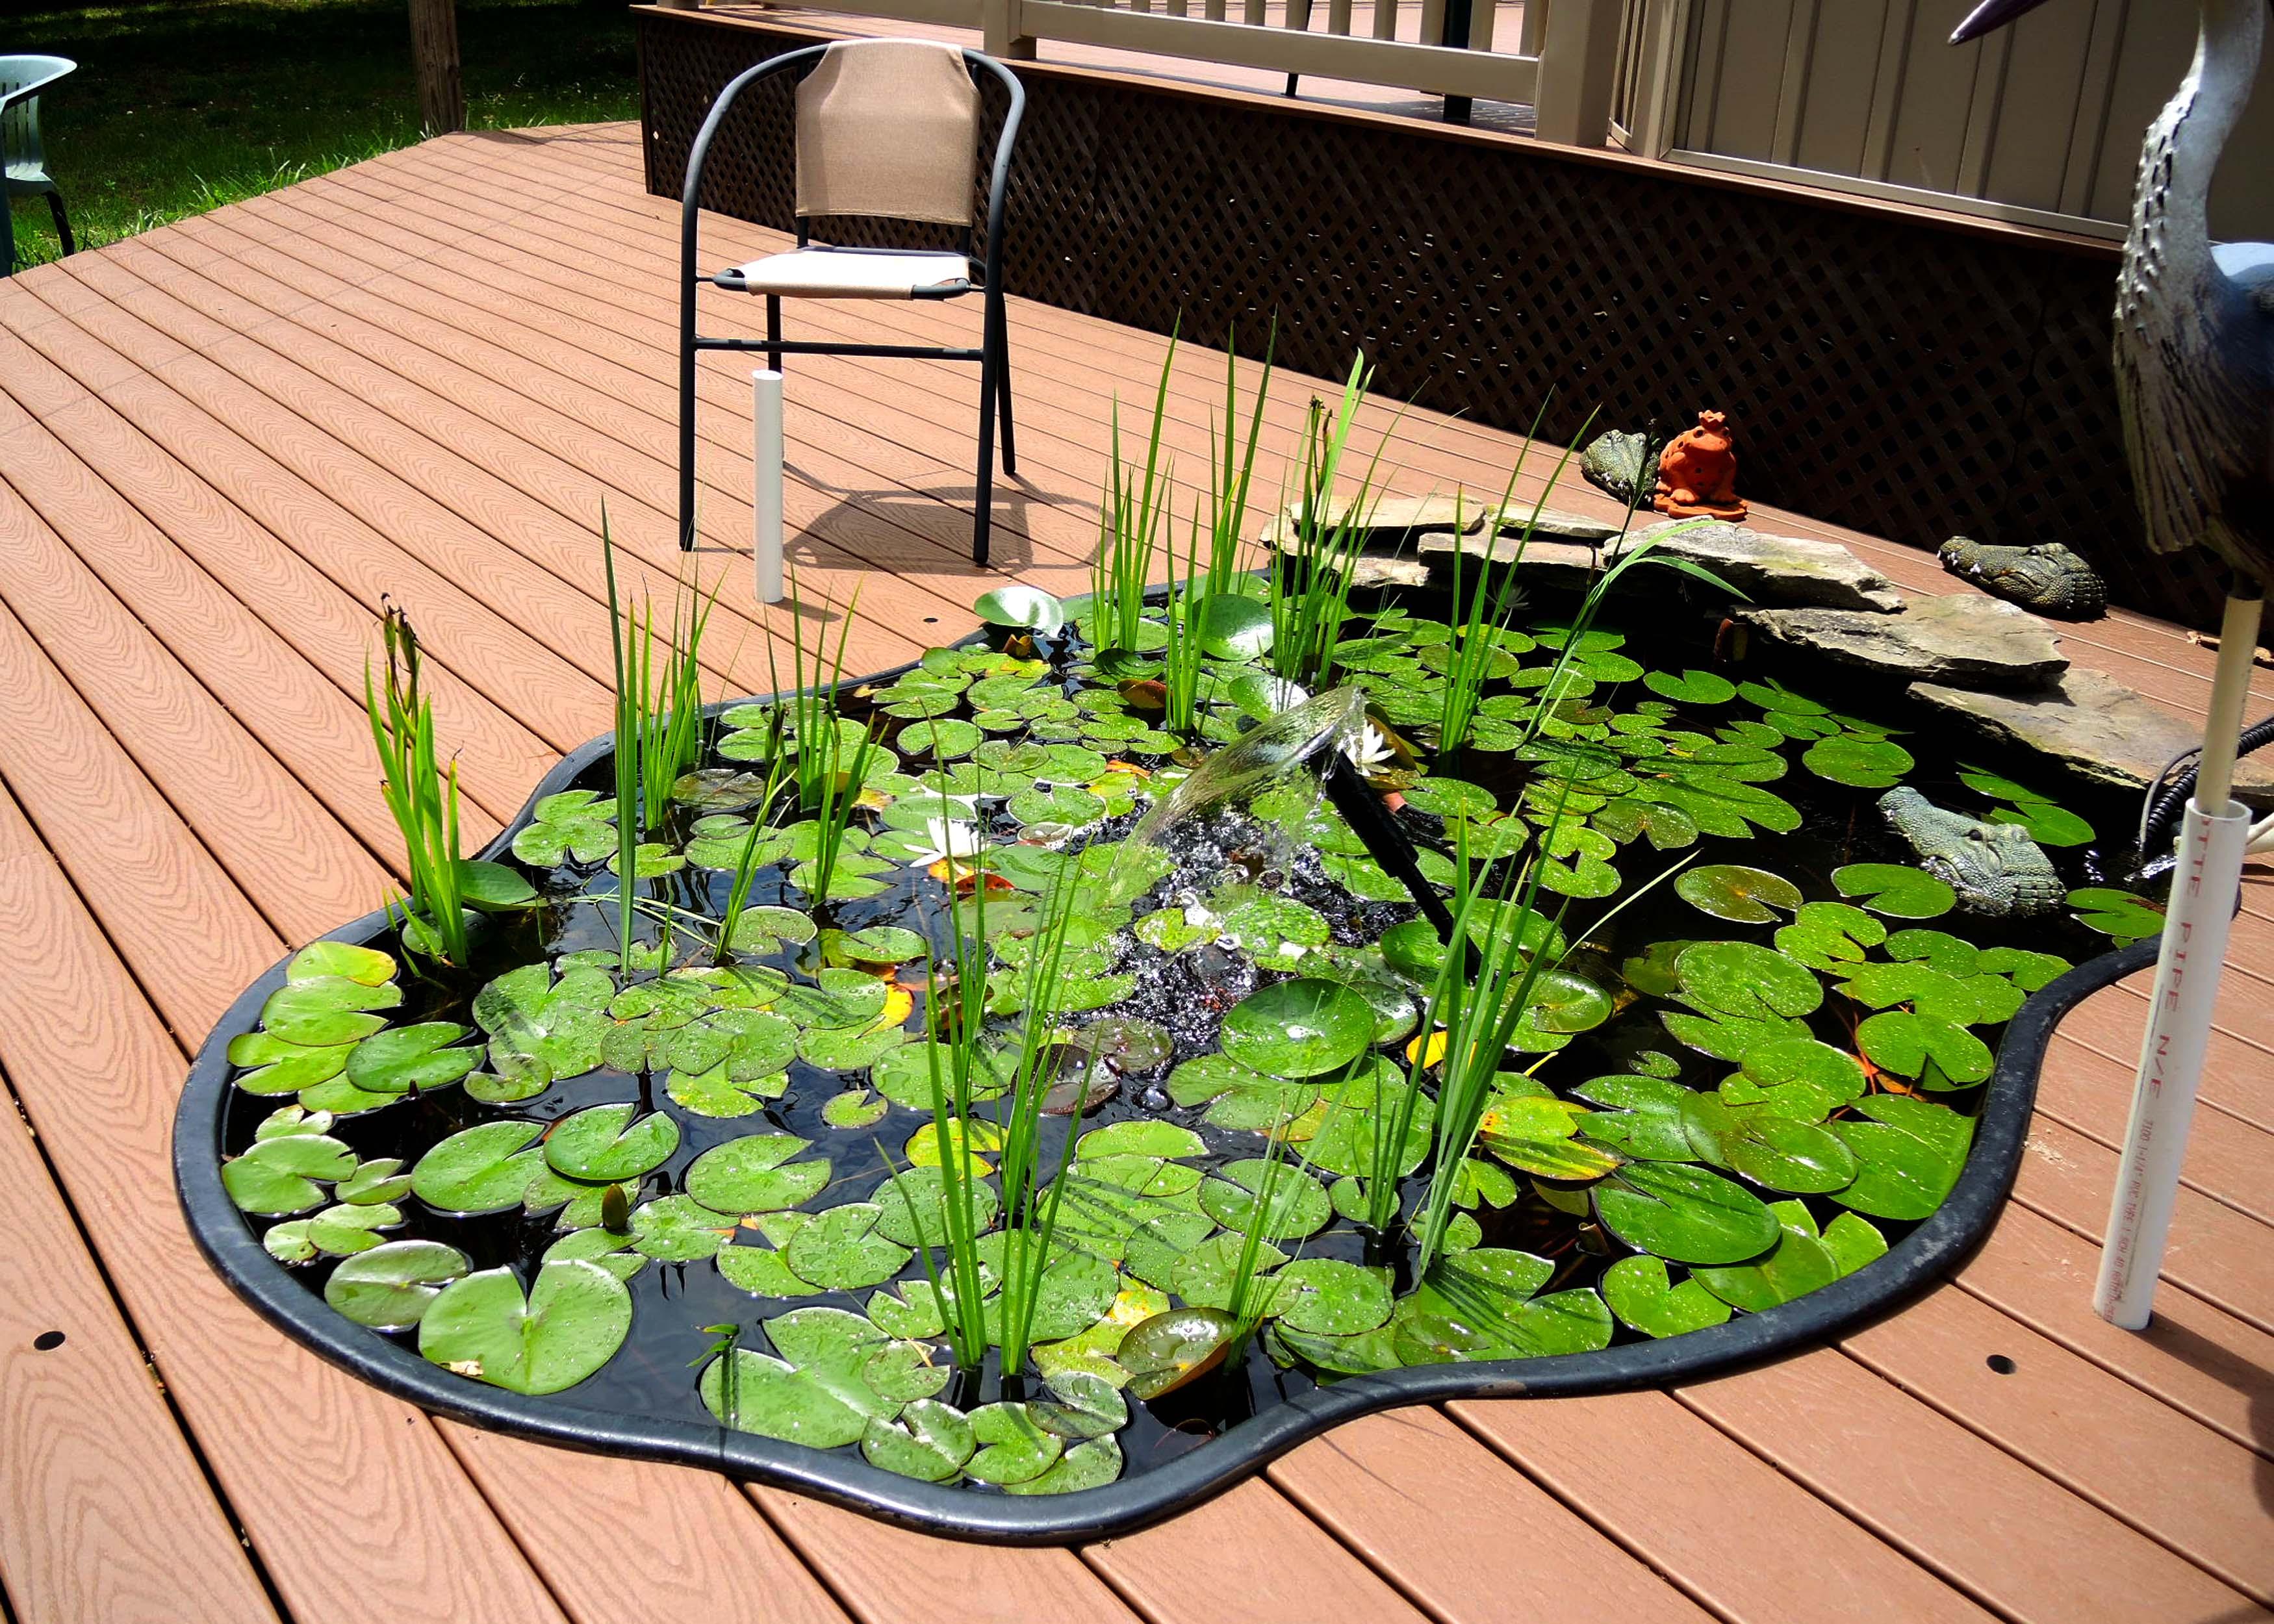 DSCN0006 - lily pond.jpg